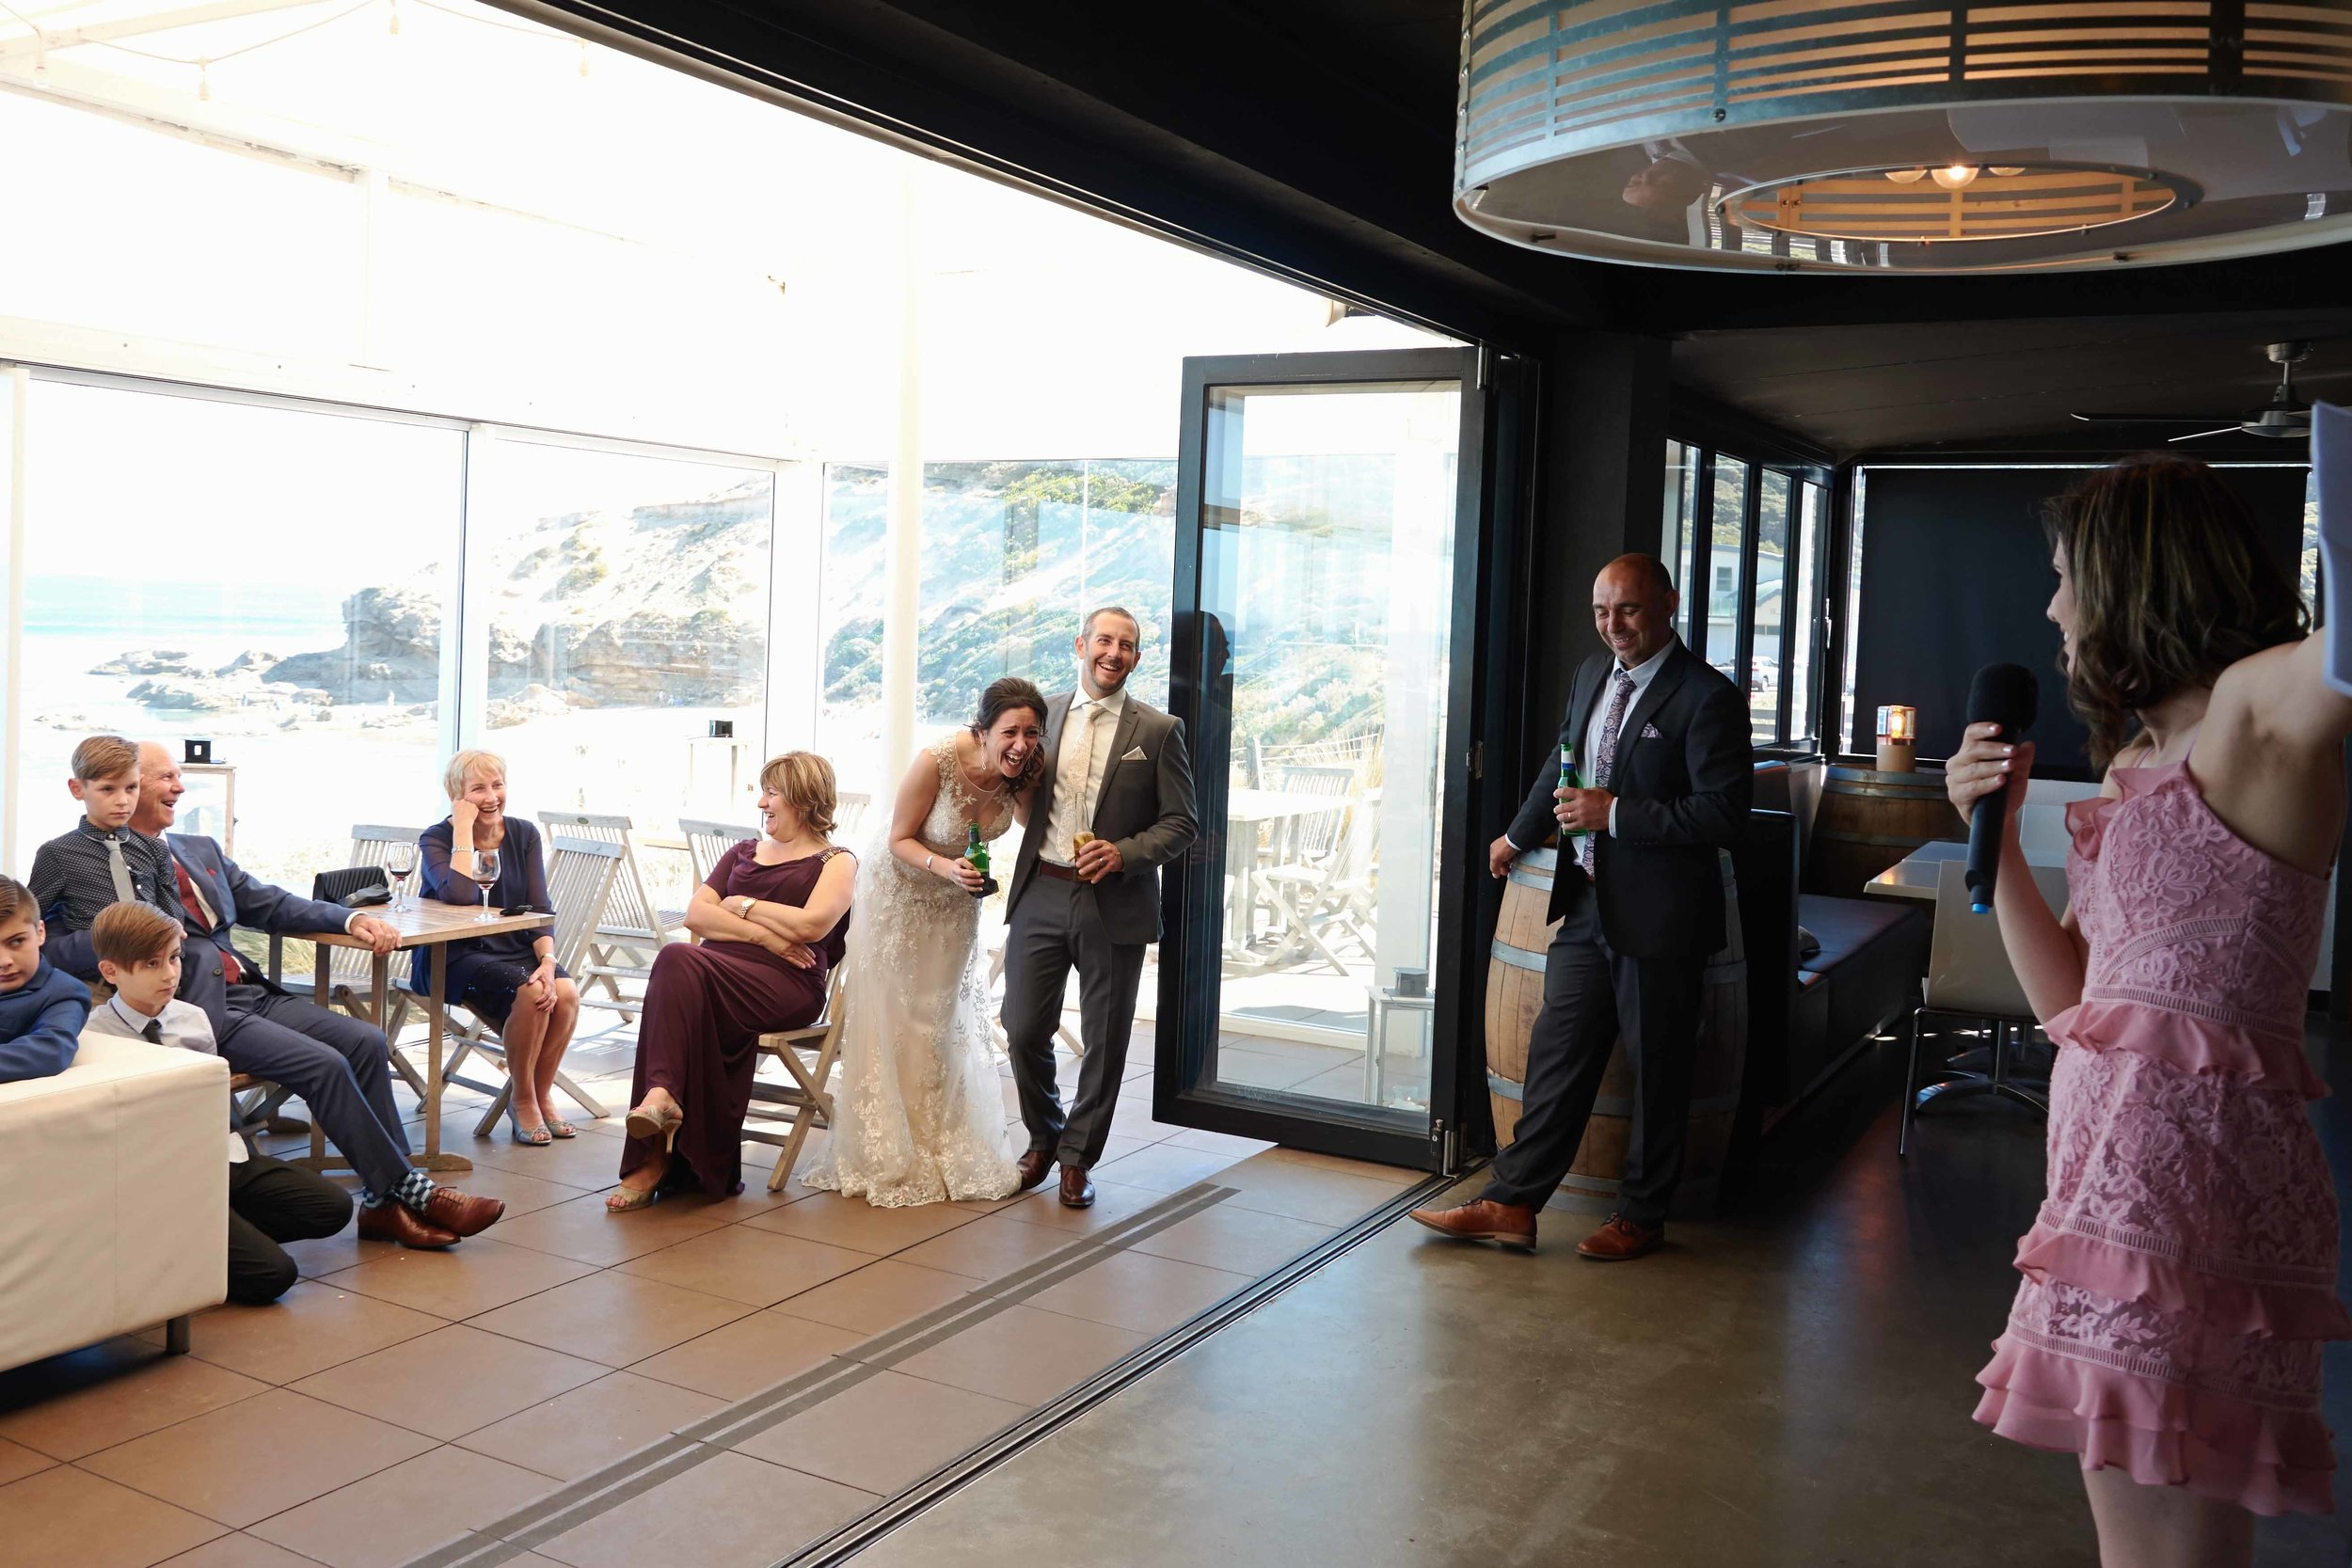 sorrento-wedding-photography-all-smiles-marissa-jade-photography-91.jpg